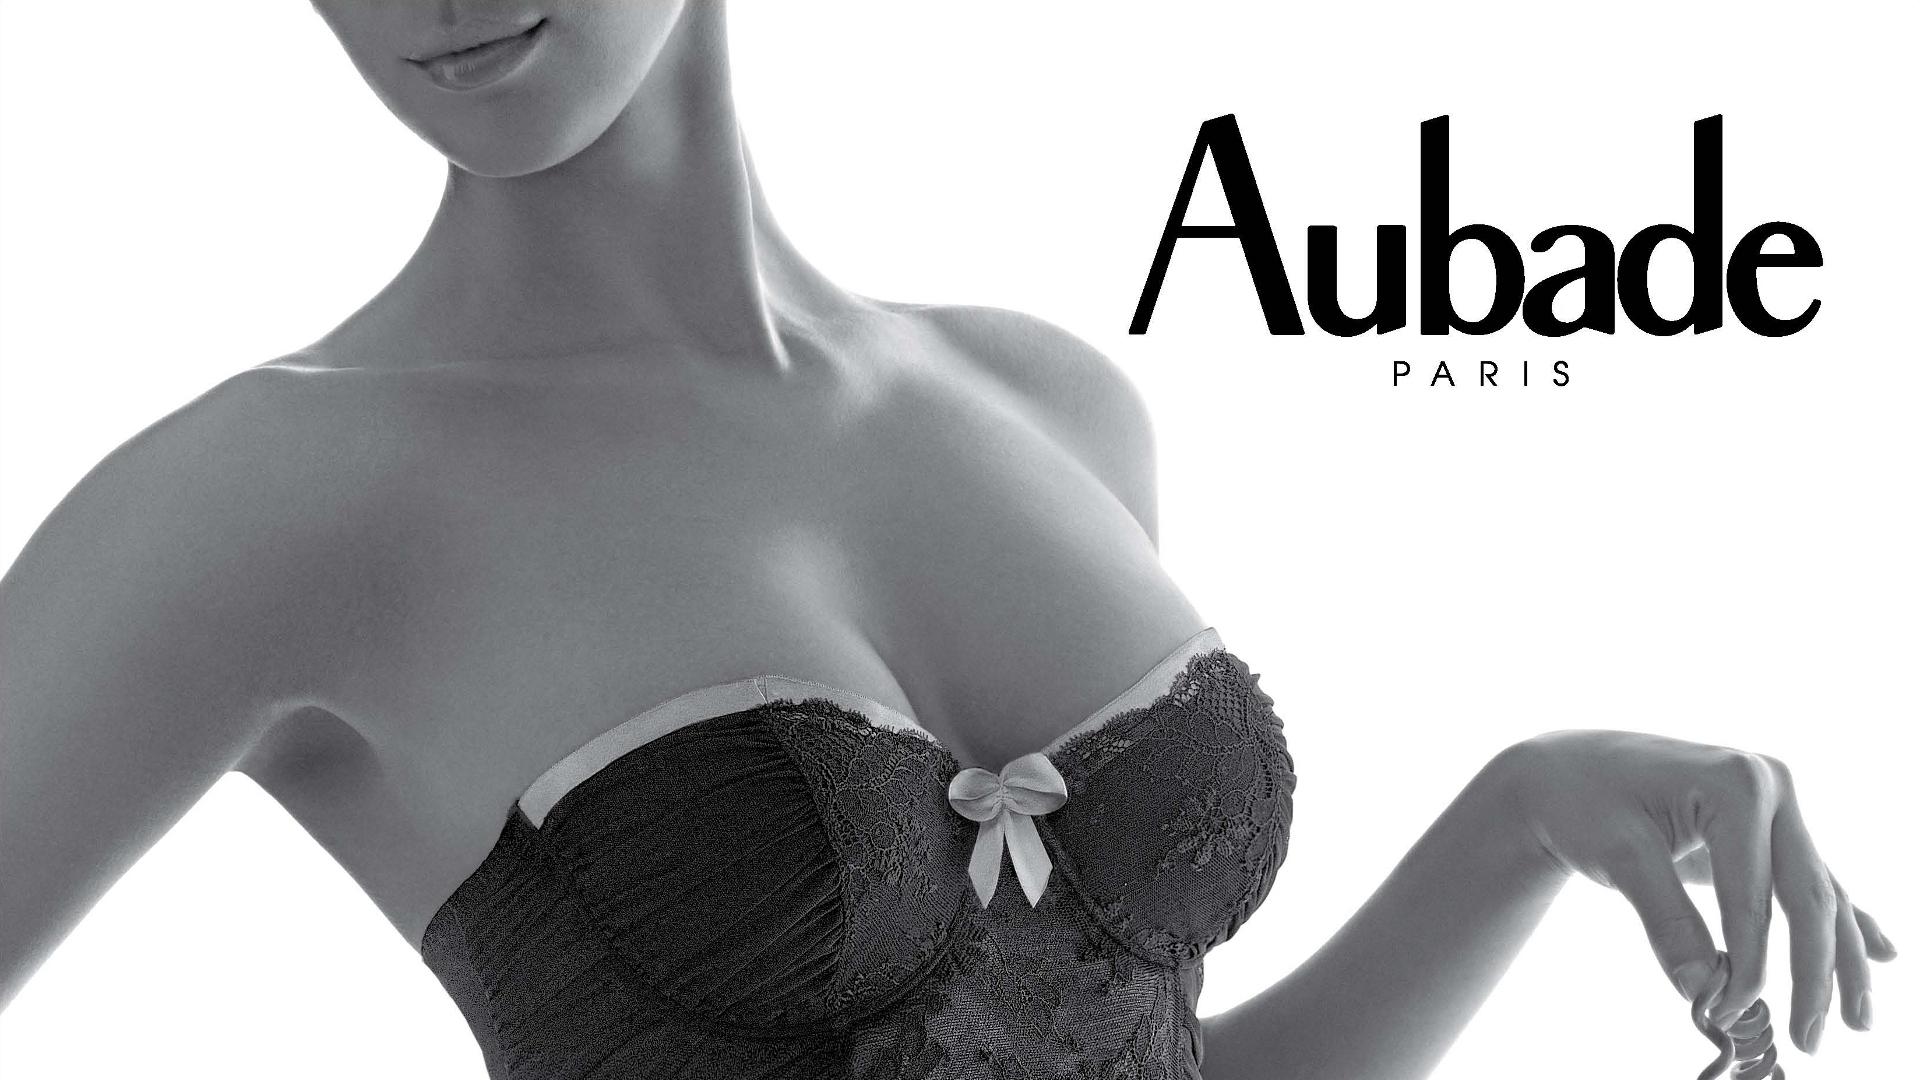 analysis of the aubade advertising